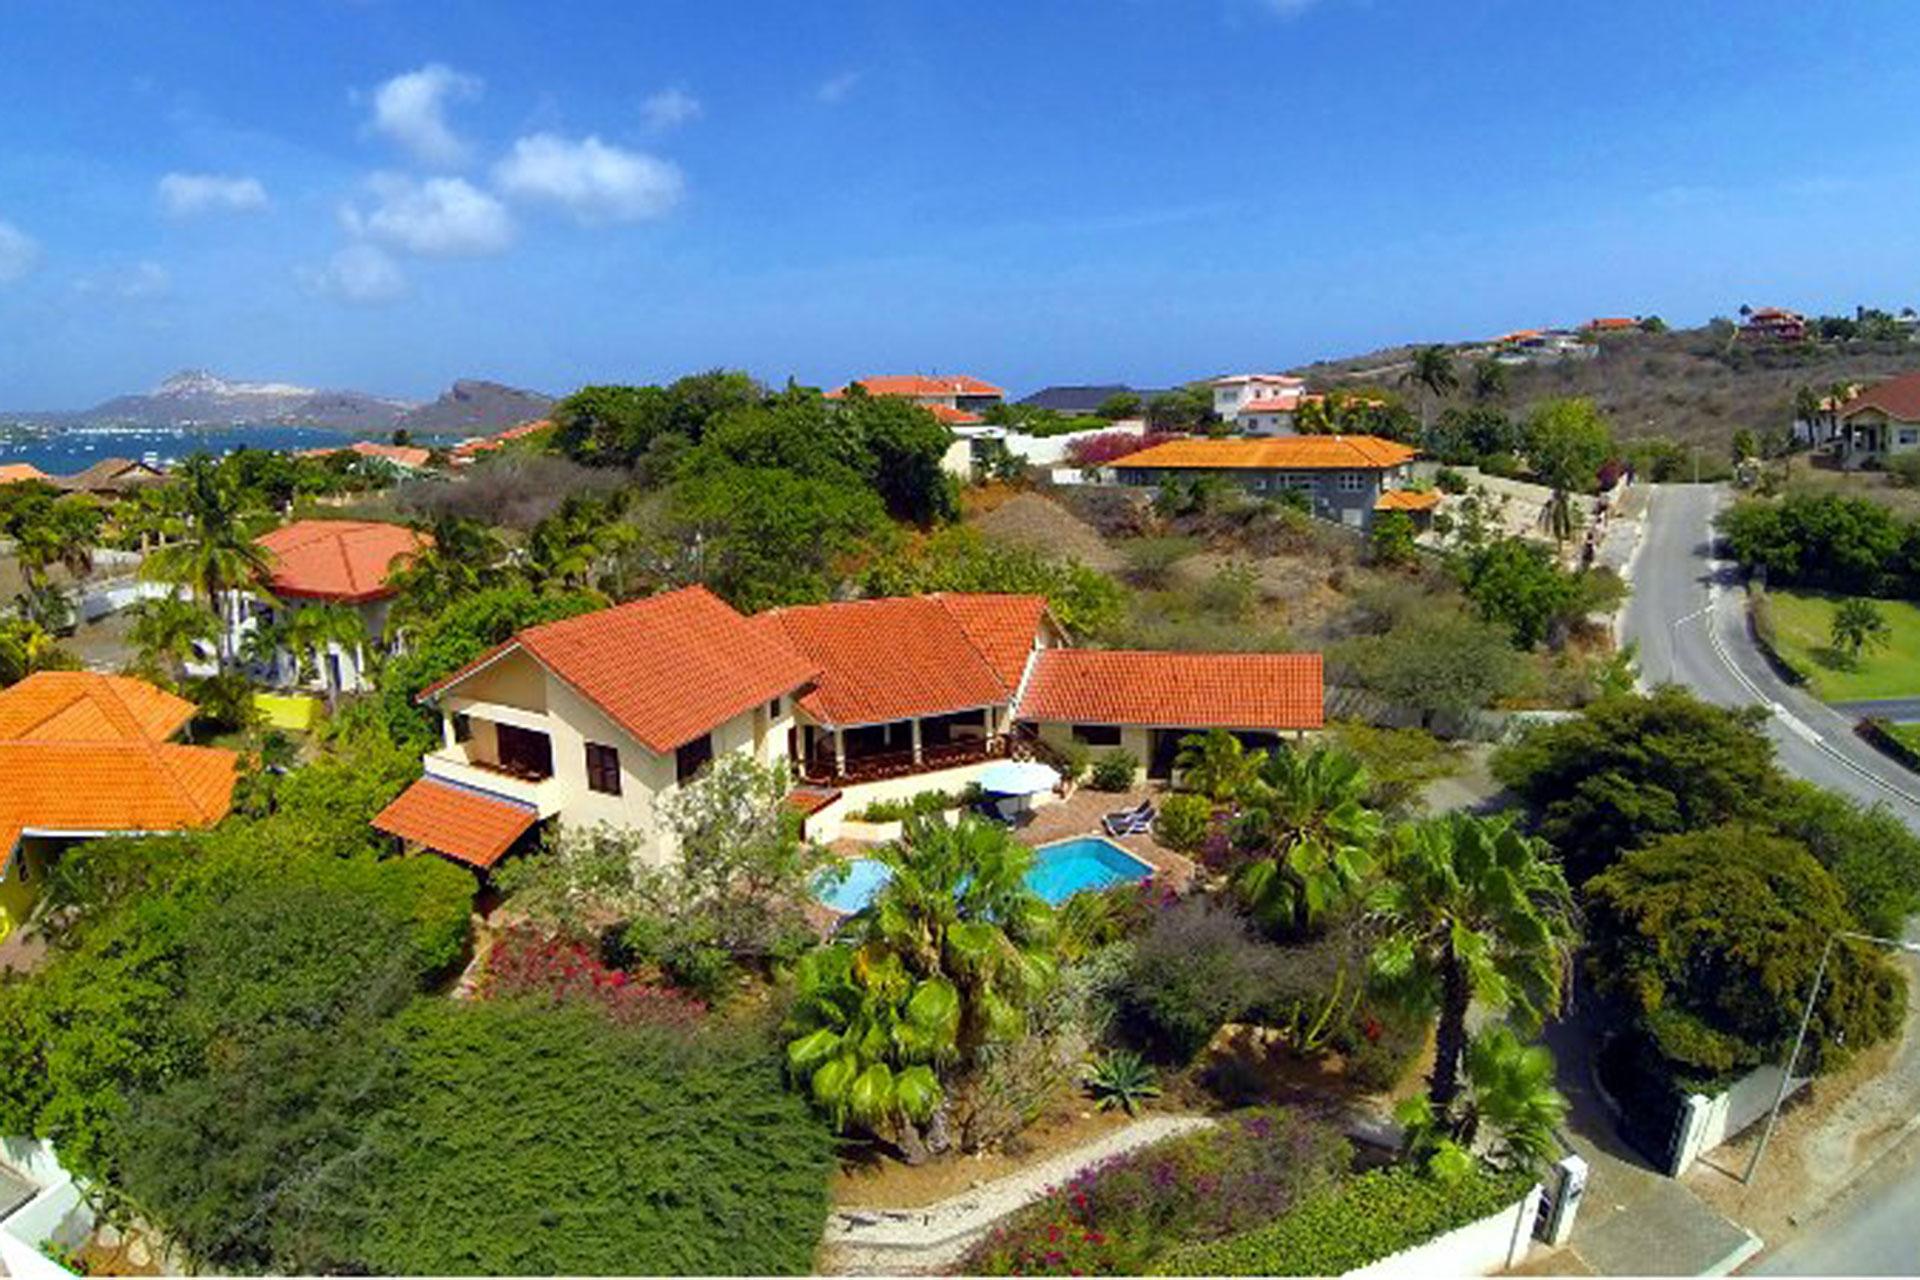 Carpe Diem Vacation Rental in Curacao; Courtesy of FlipKey/TripAdvisor